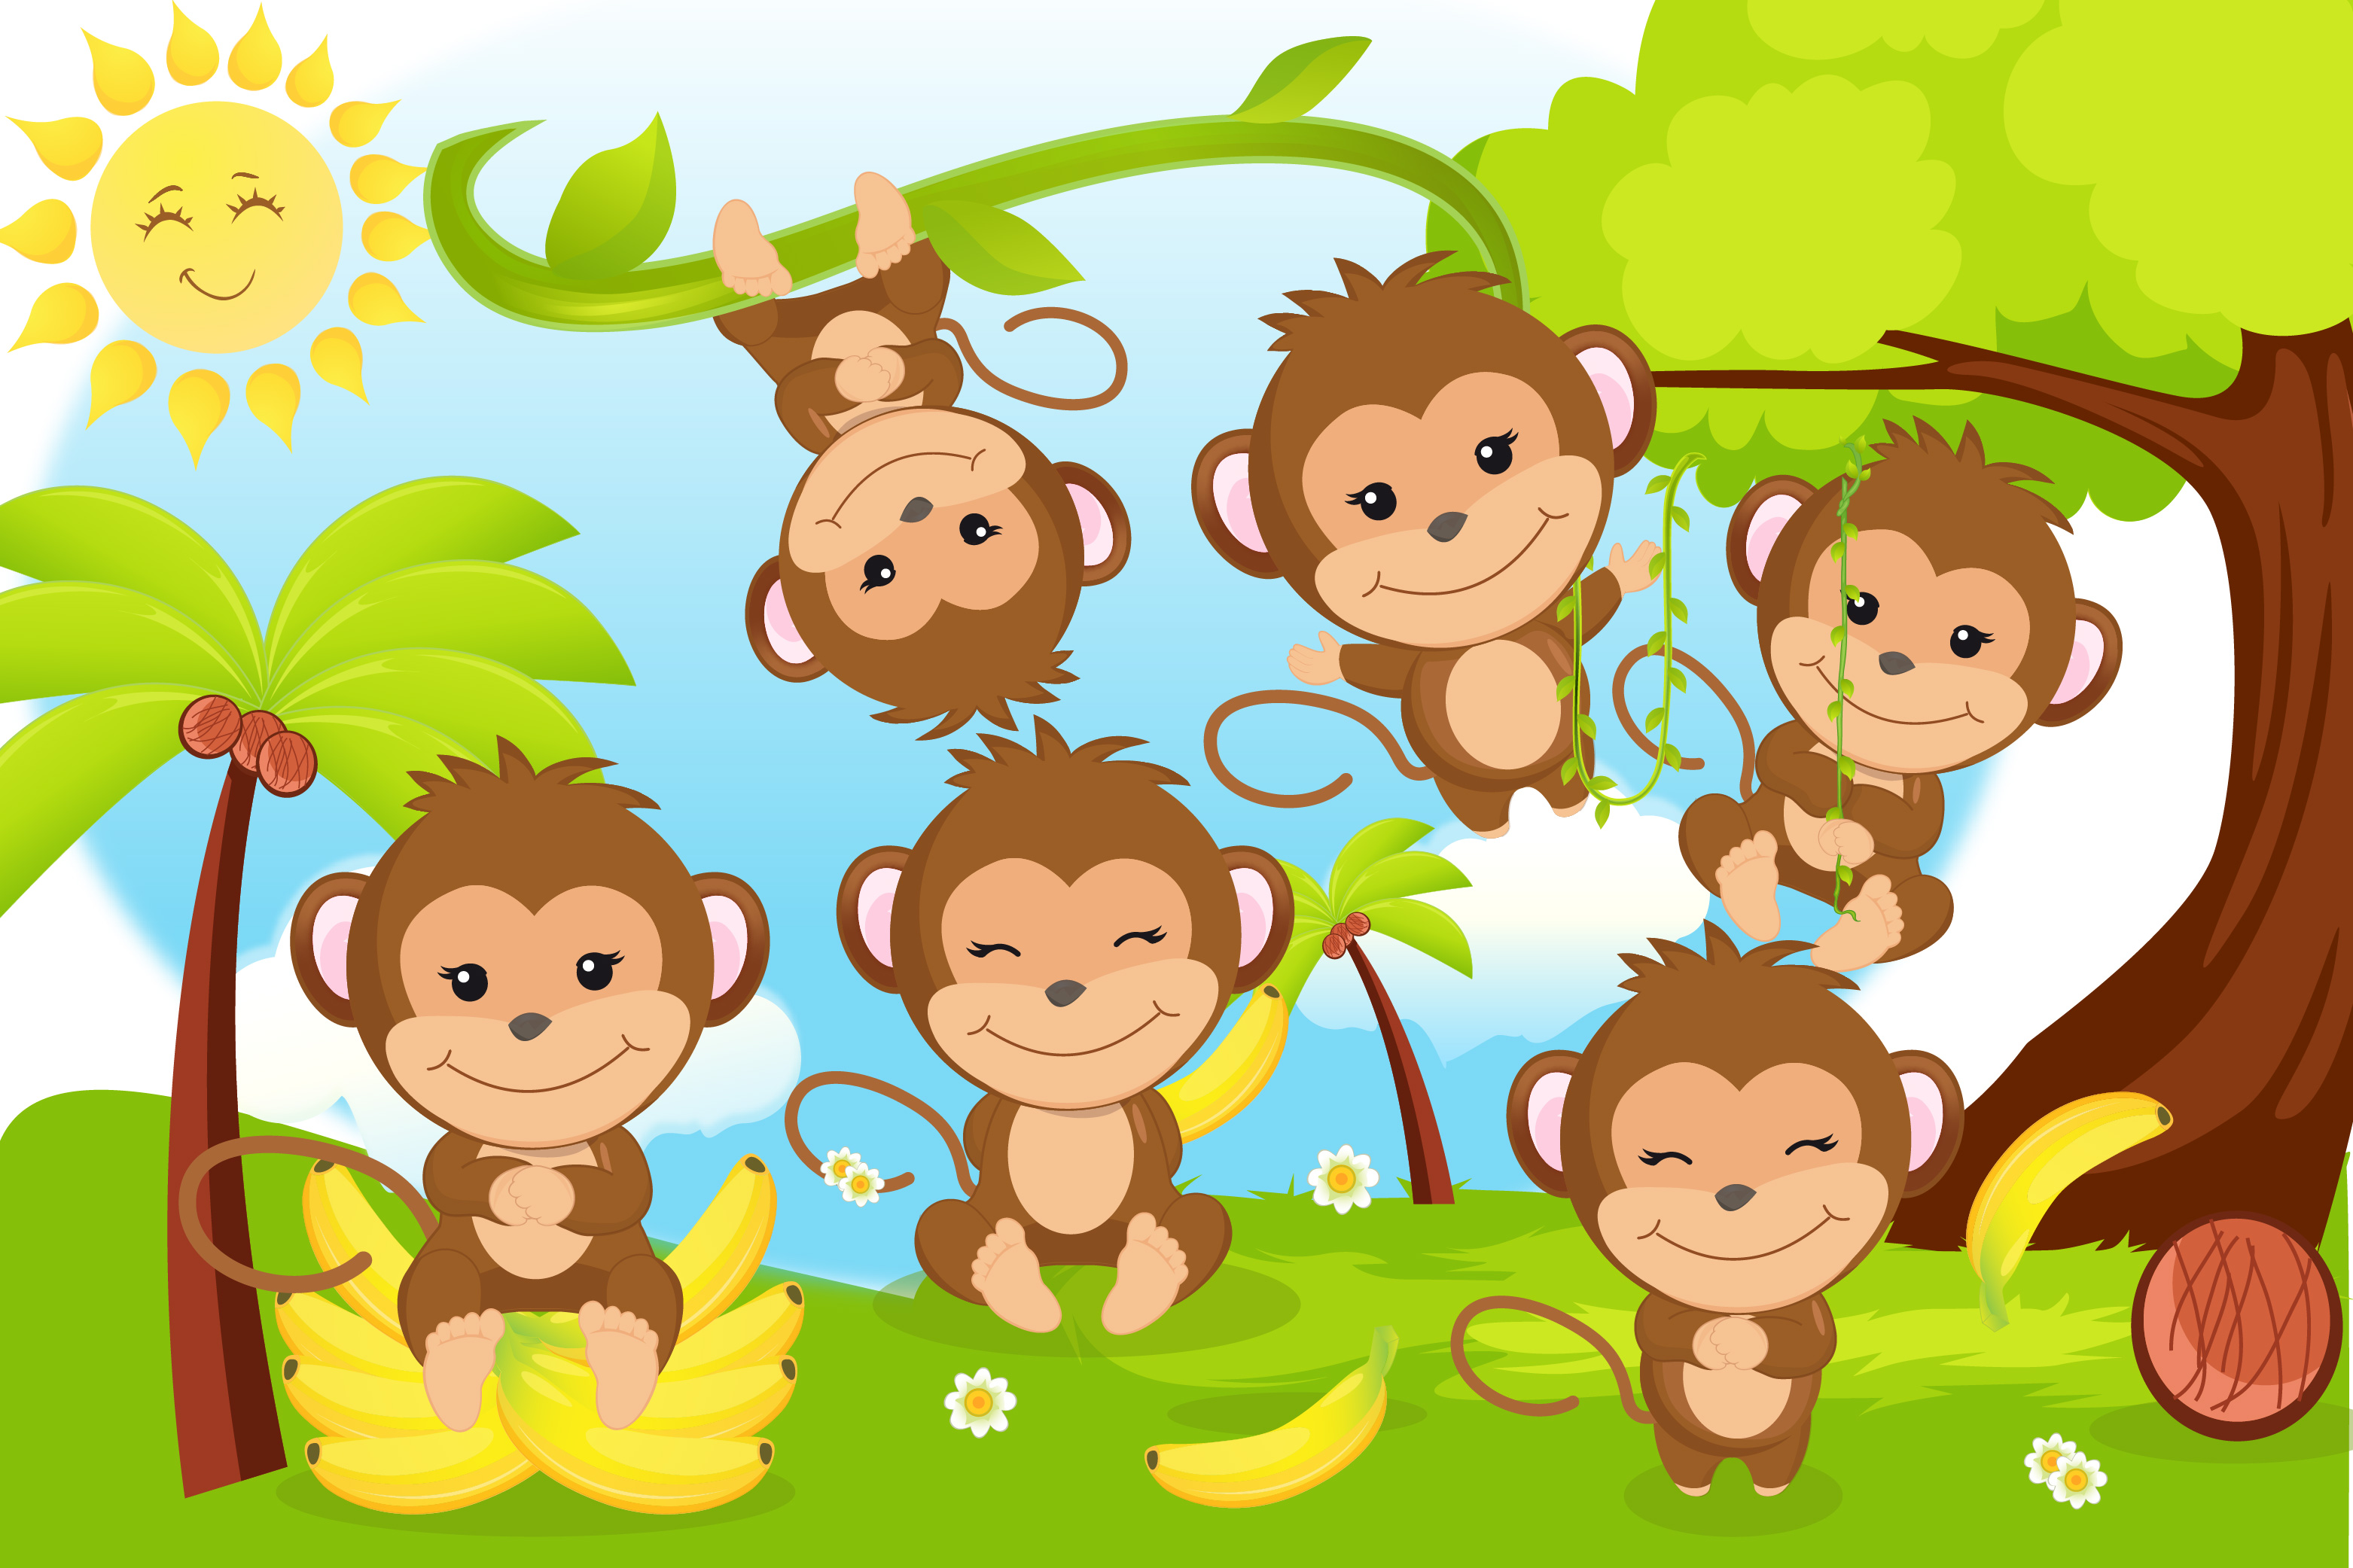 Monkey clipart svg transparent download Monkey clipart, Monkey boy illustrations svg transparent download